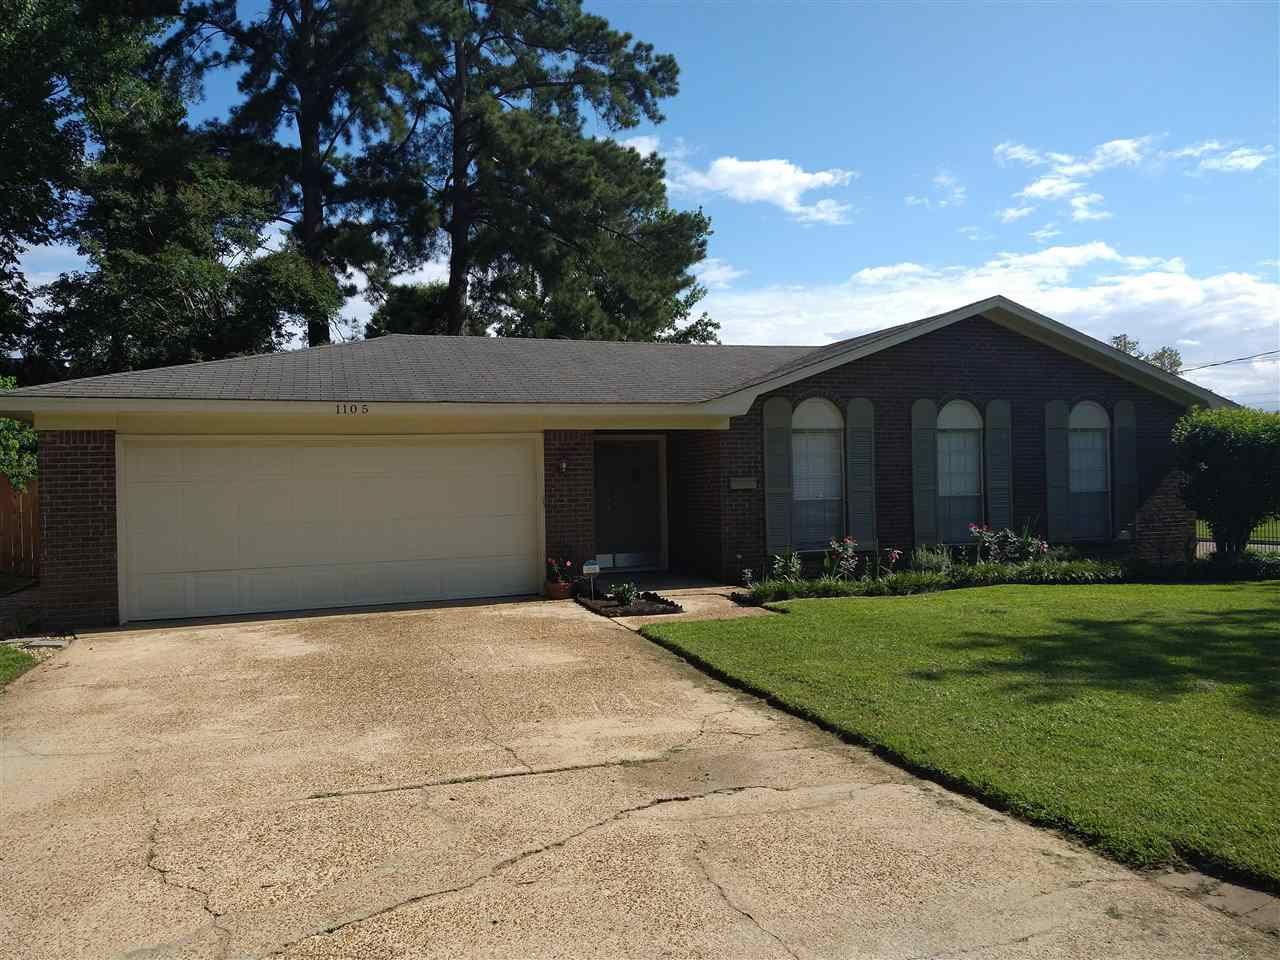 1105 PLANTATION BLVD, Jackson, MS 39211 - MLS#: 342240